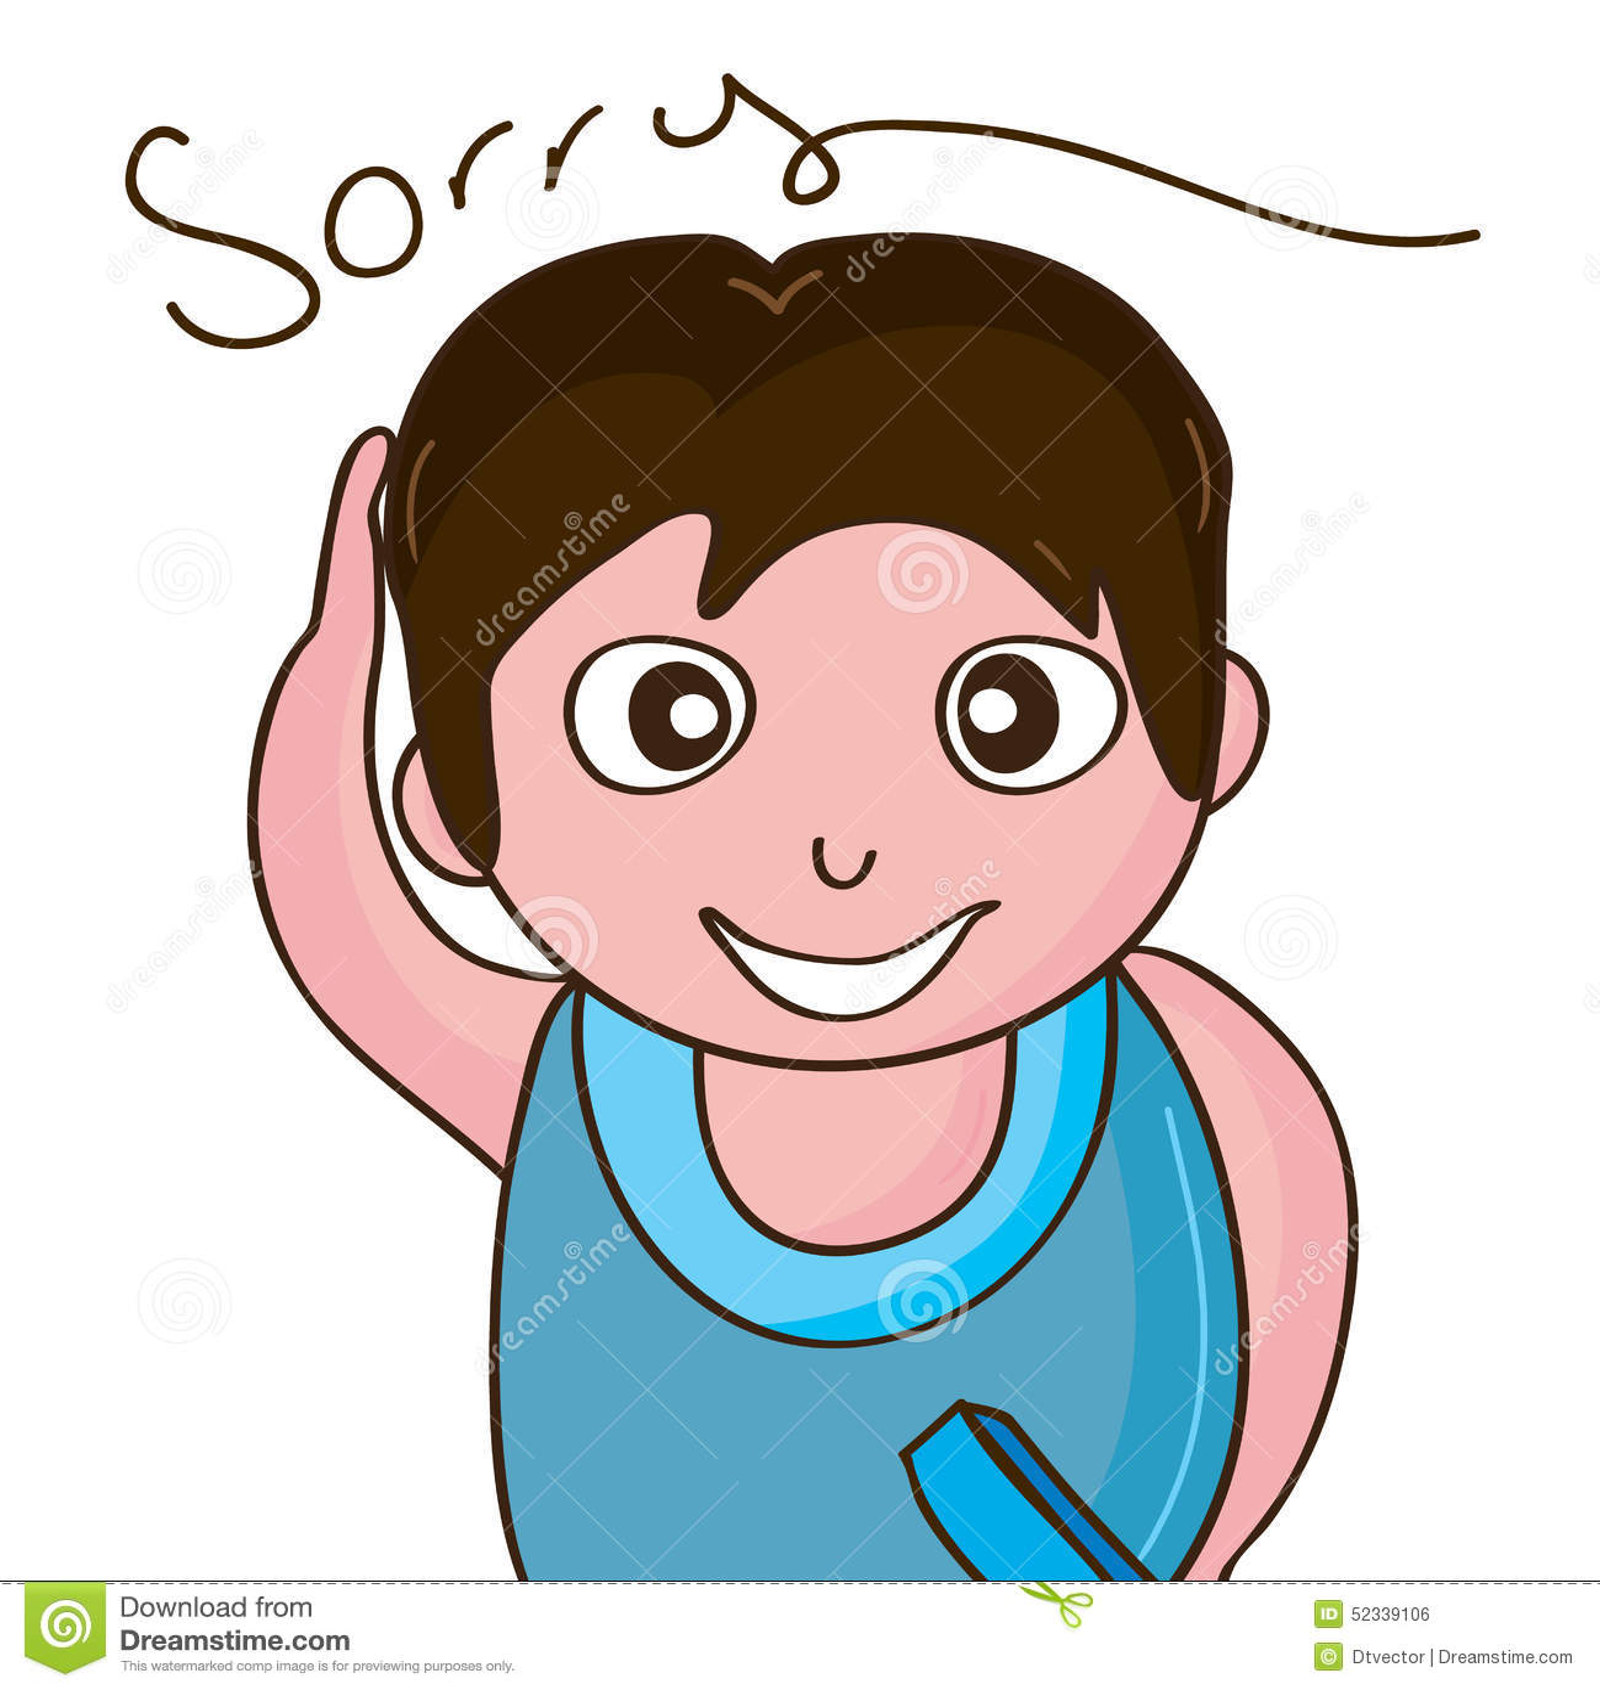 boy saying sorry